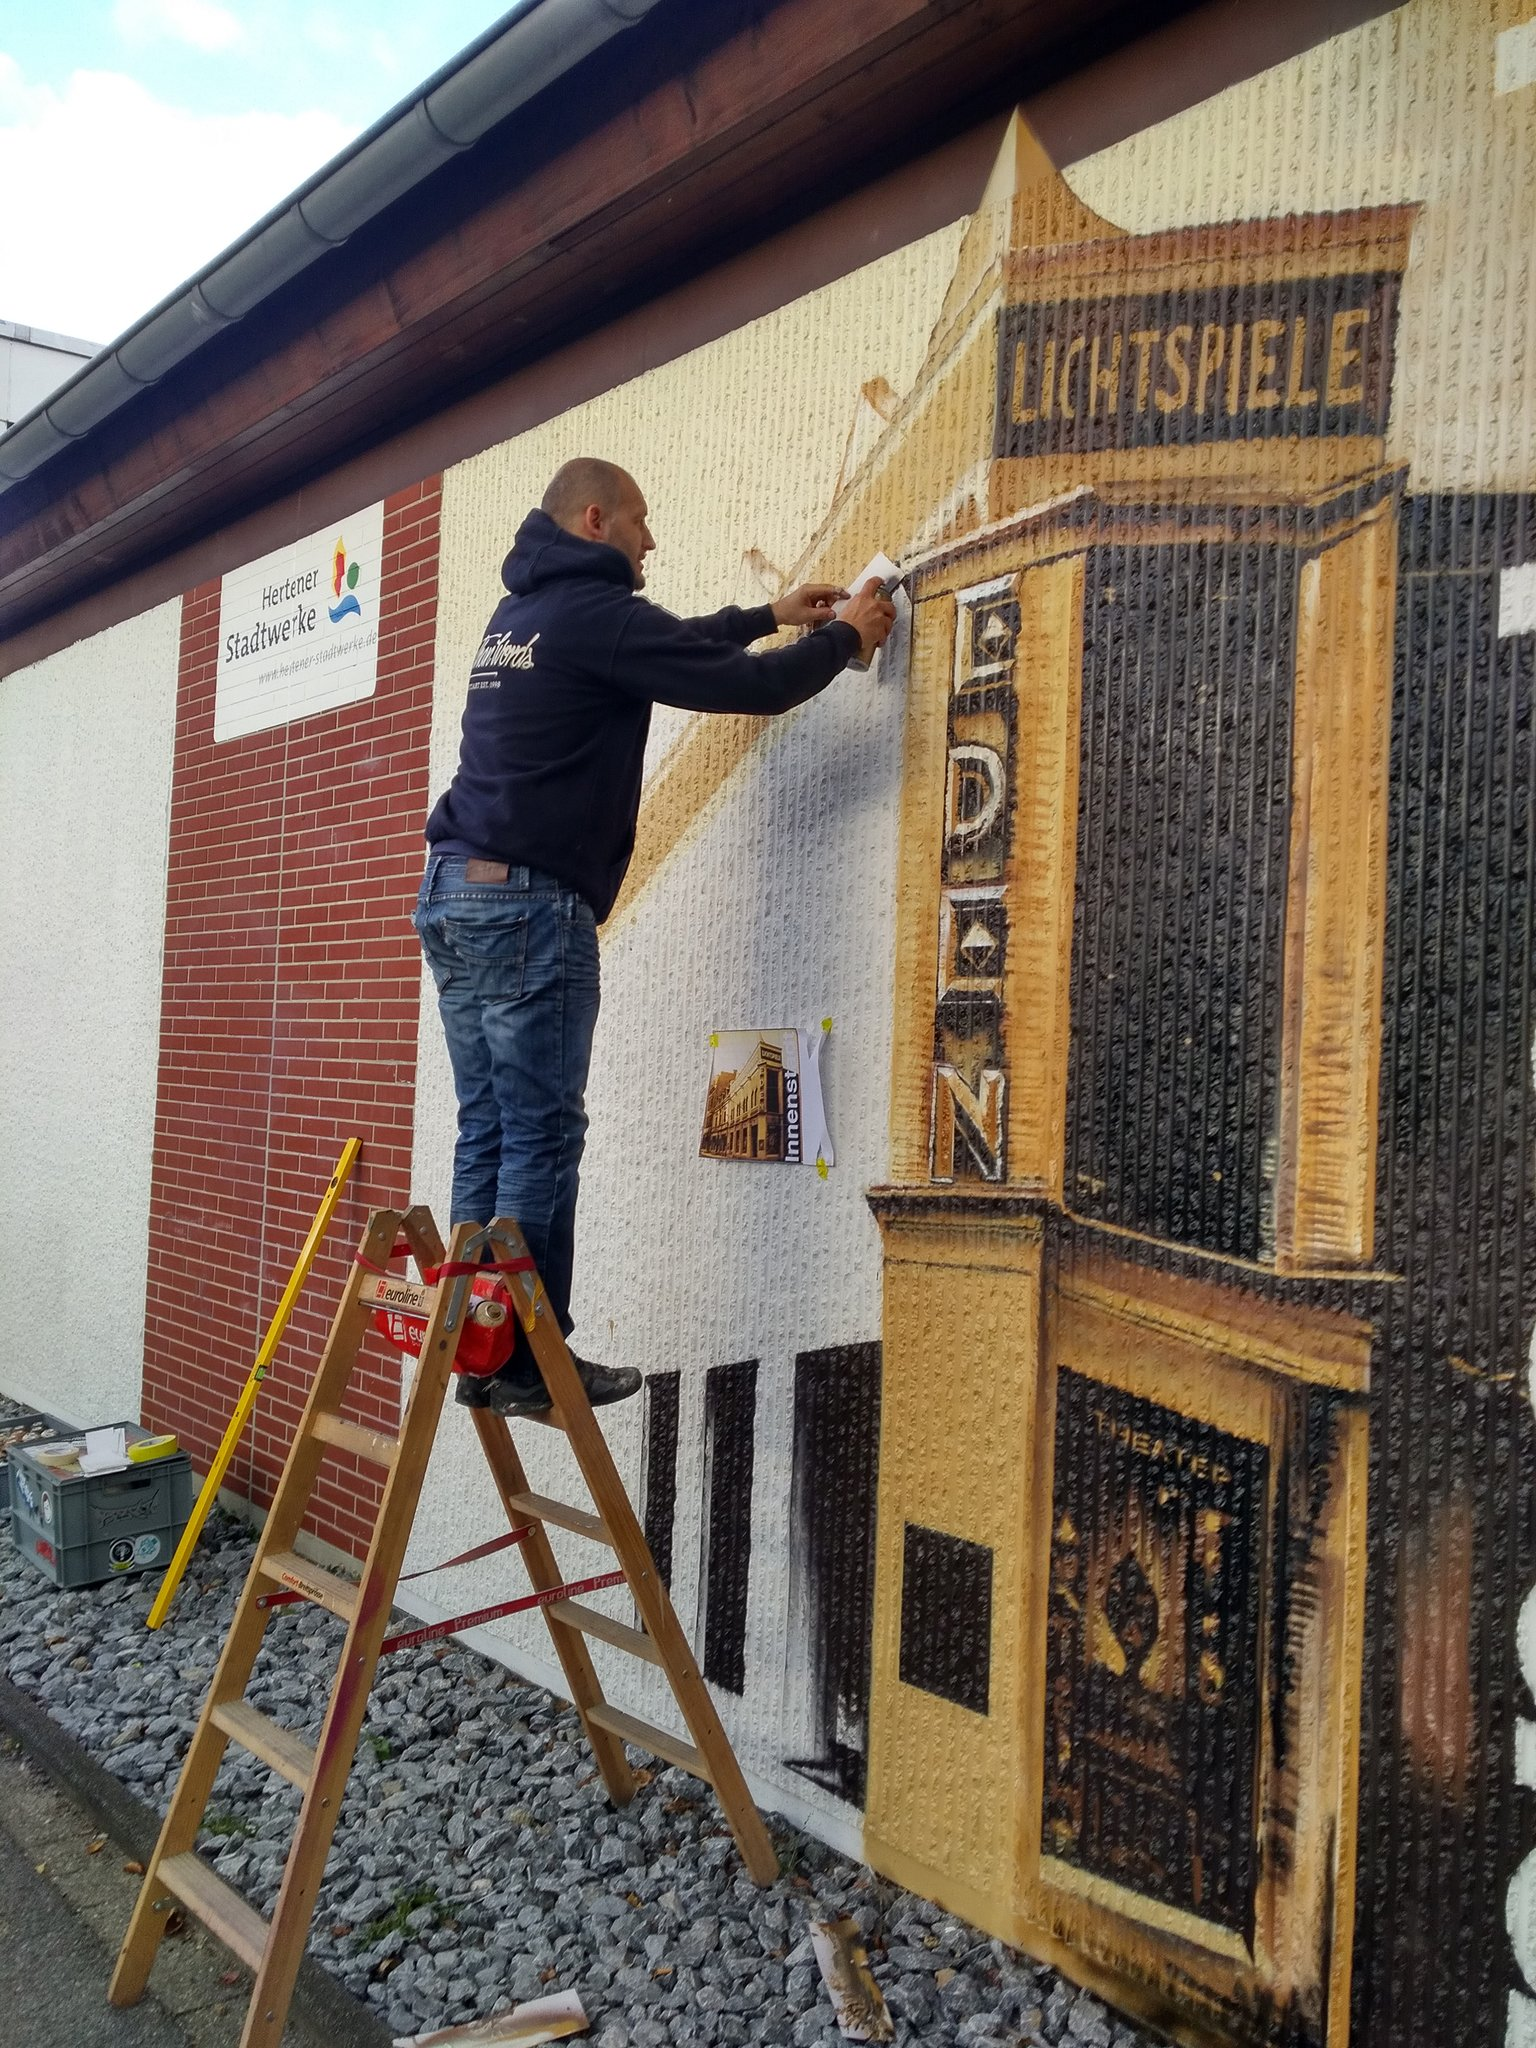 Trafostation an der Papst-Johannes-Straße ist fertig: Historisches Graffiti in Herten - Herten - Lokalkompass.de